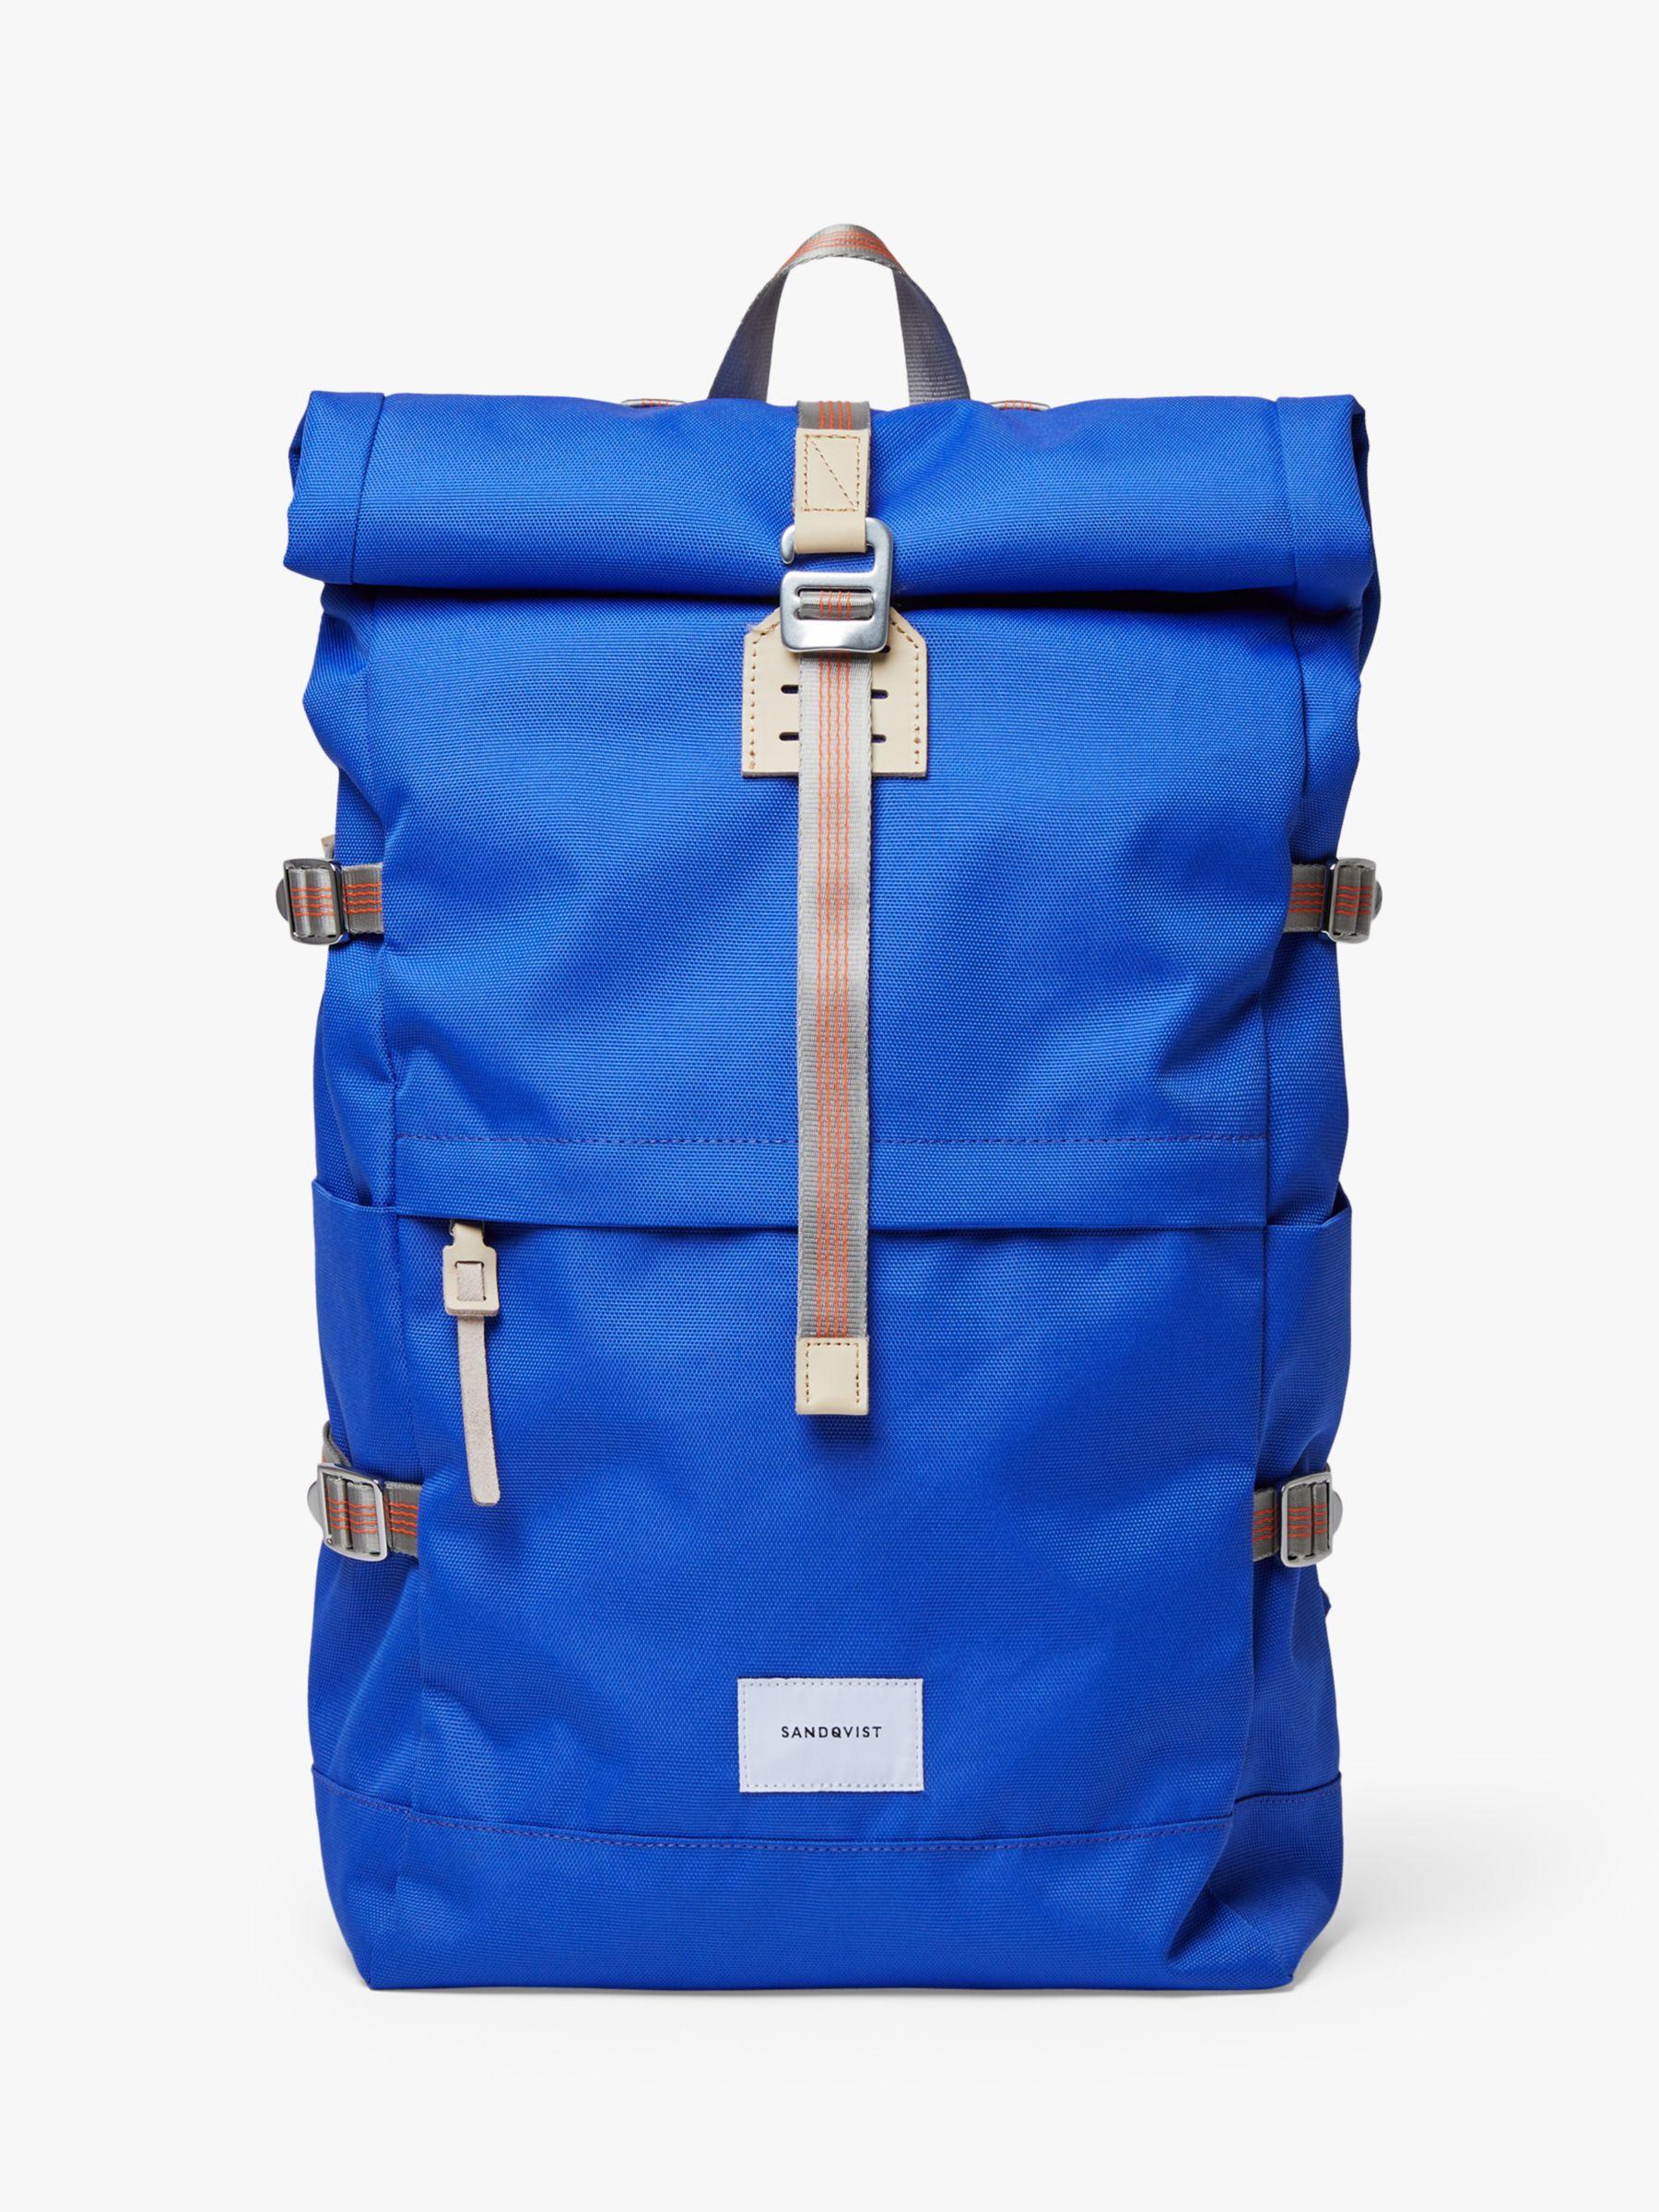 Sandqvist Sandqvist Bernt Recycled Rolltop Backpack, Bright Blue